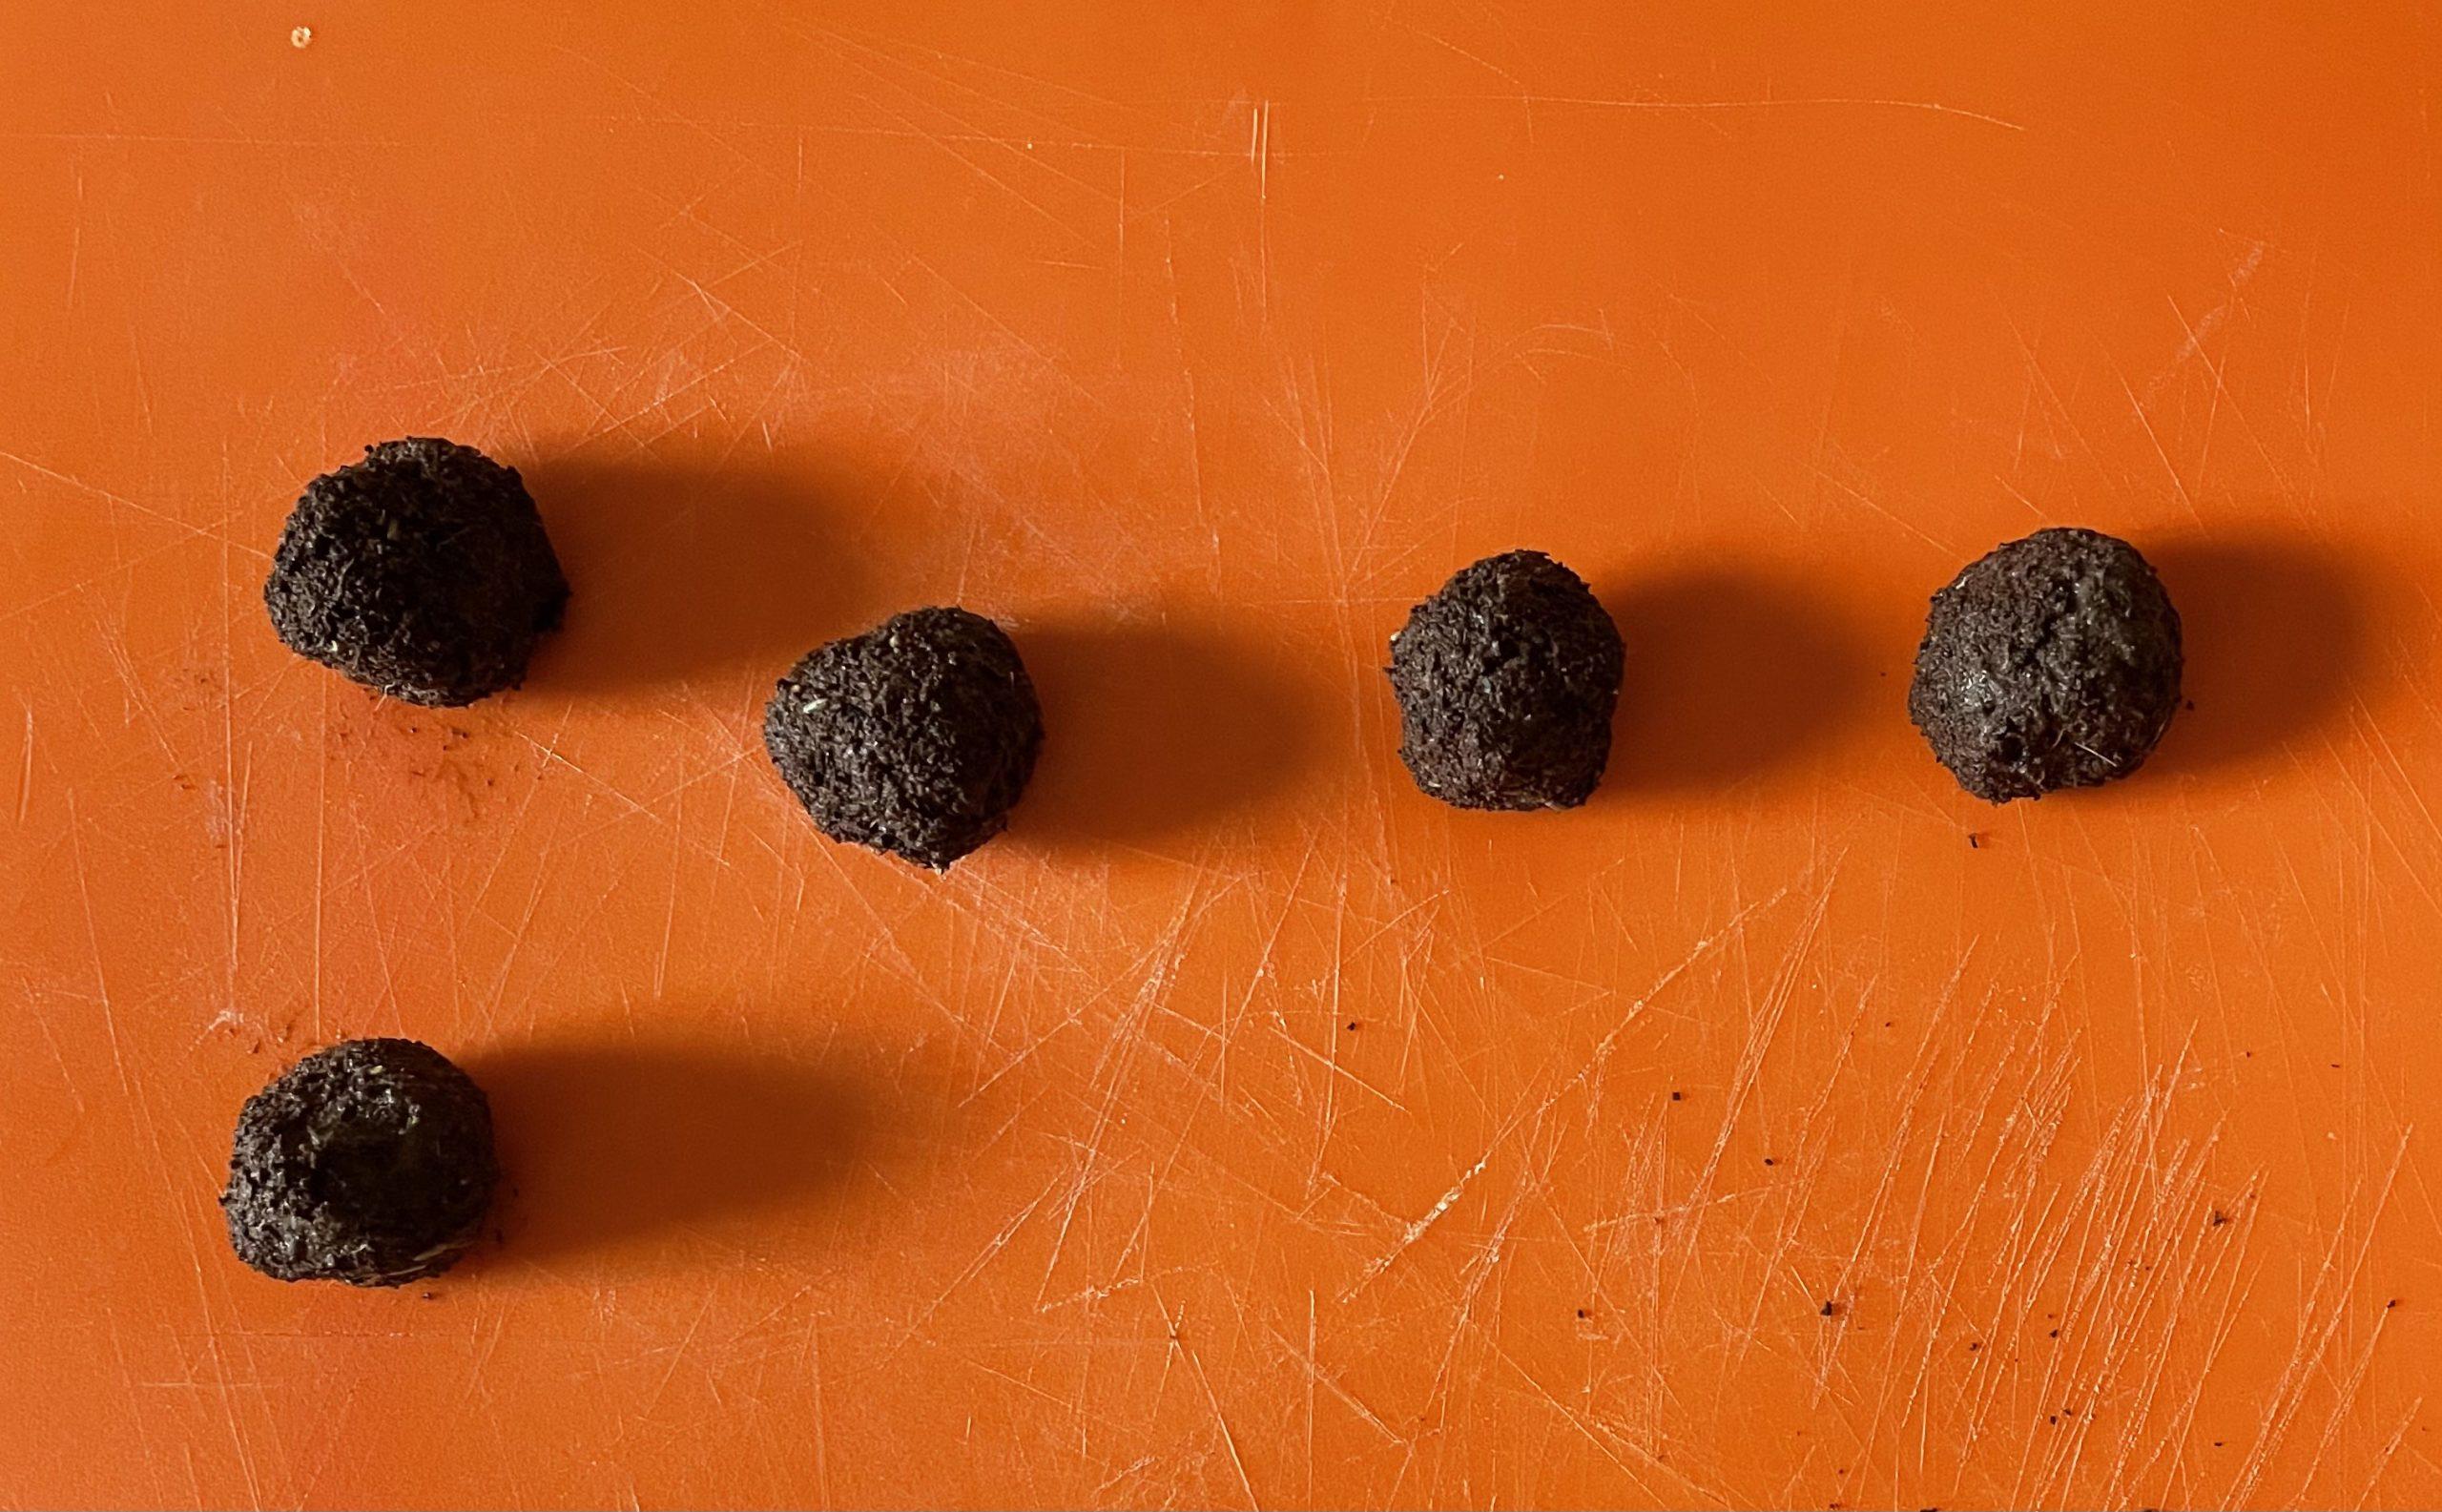 5x Mud and Bloom seed bombs on an orange board